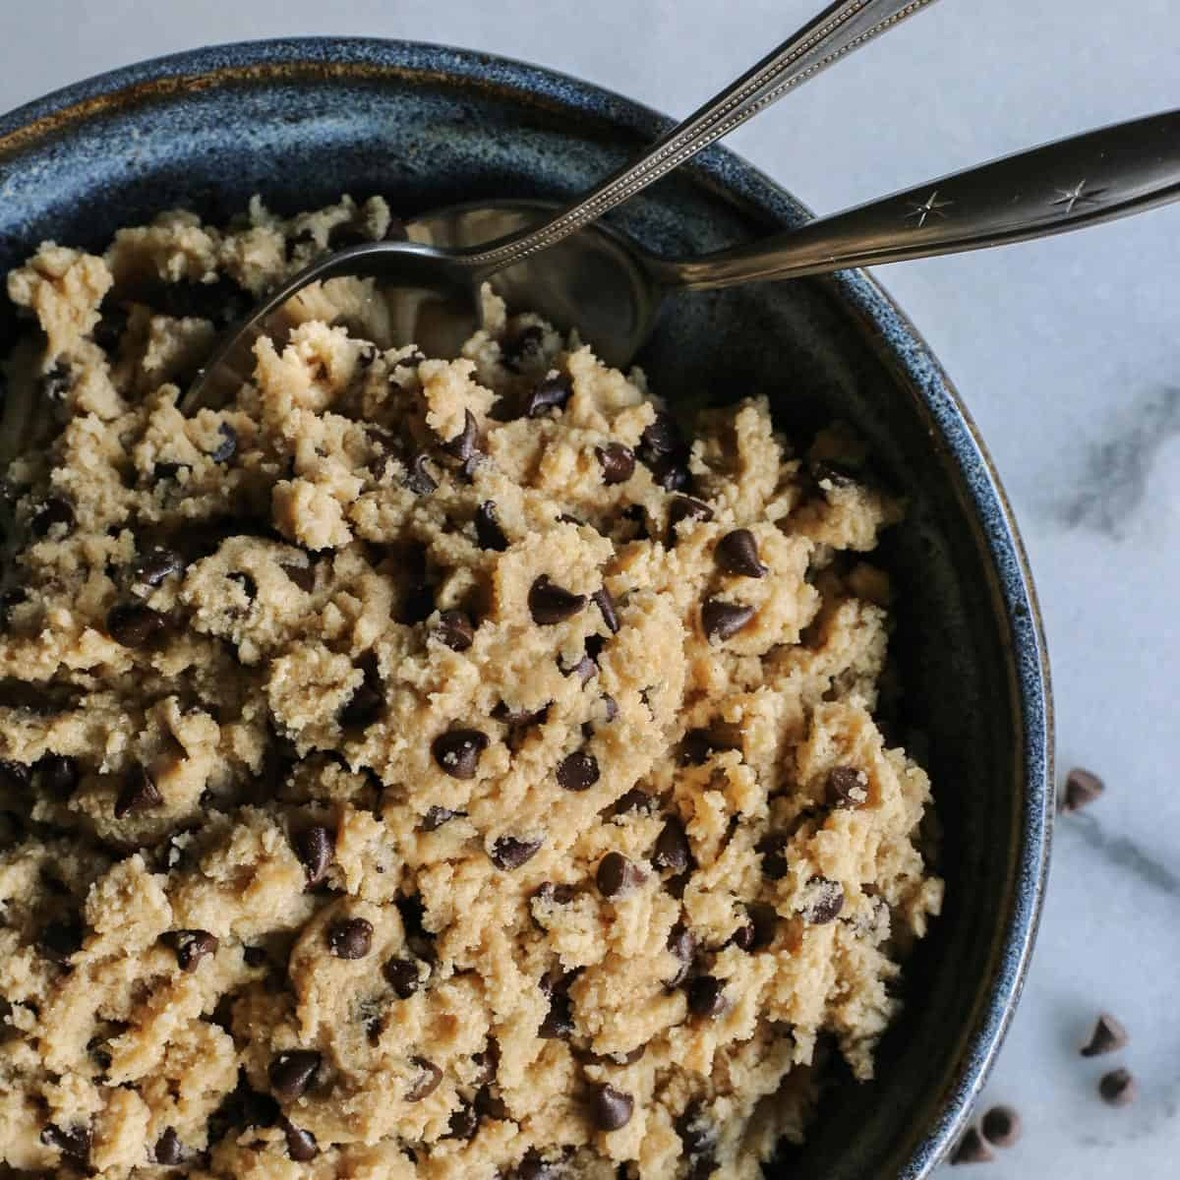 edible-cookie-dough AFarmgirlsDabbles AFD-5-sq